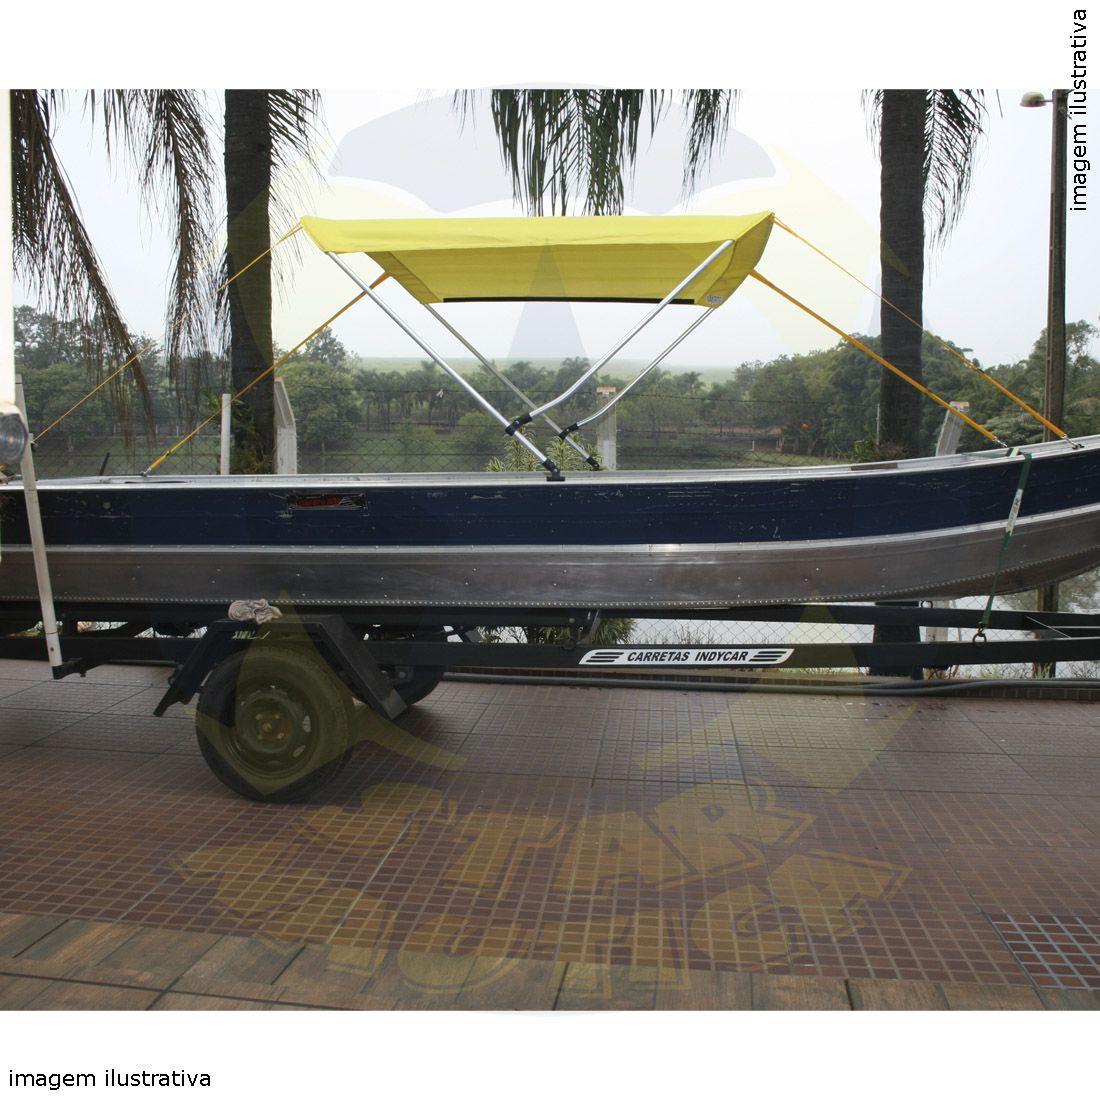 Capota Toldo Barco Calaça 600 Poliéster 2 Arcos Tubo 7/8